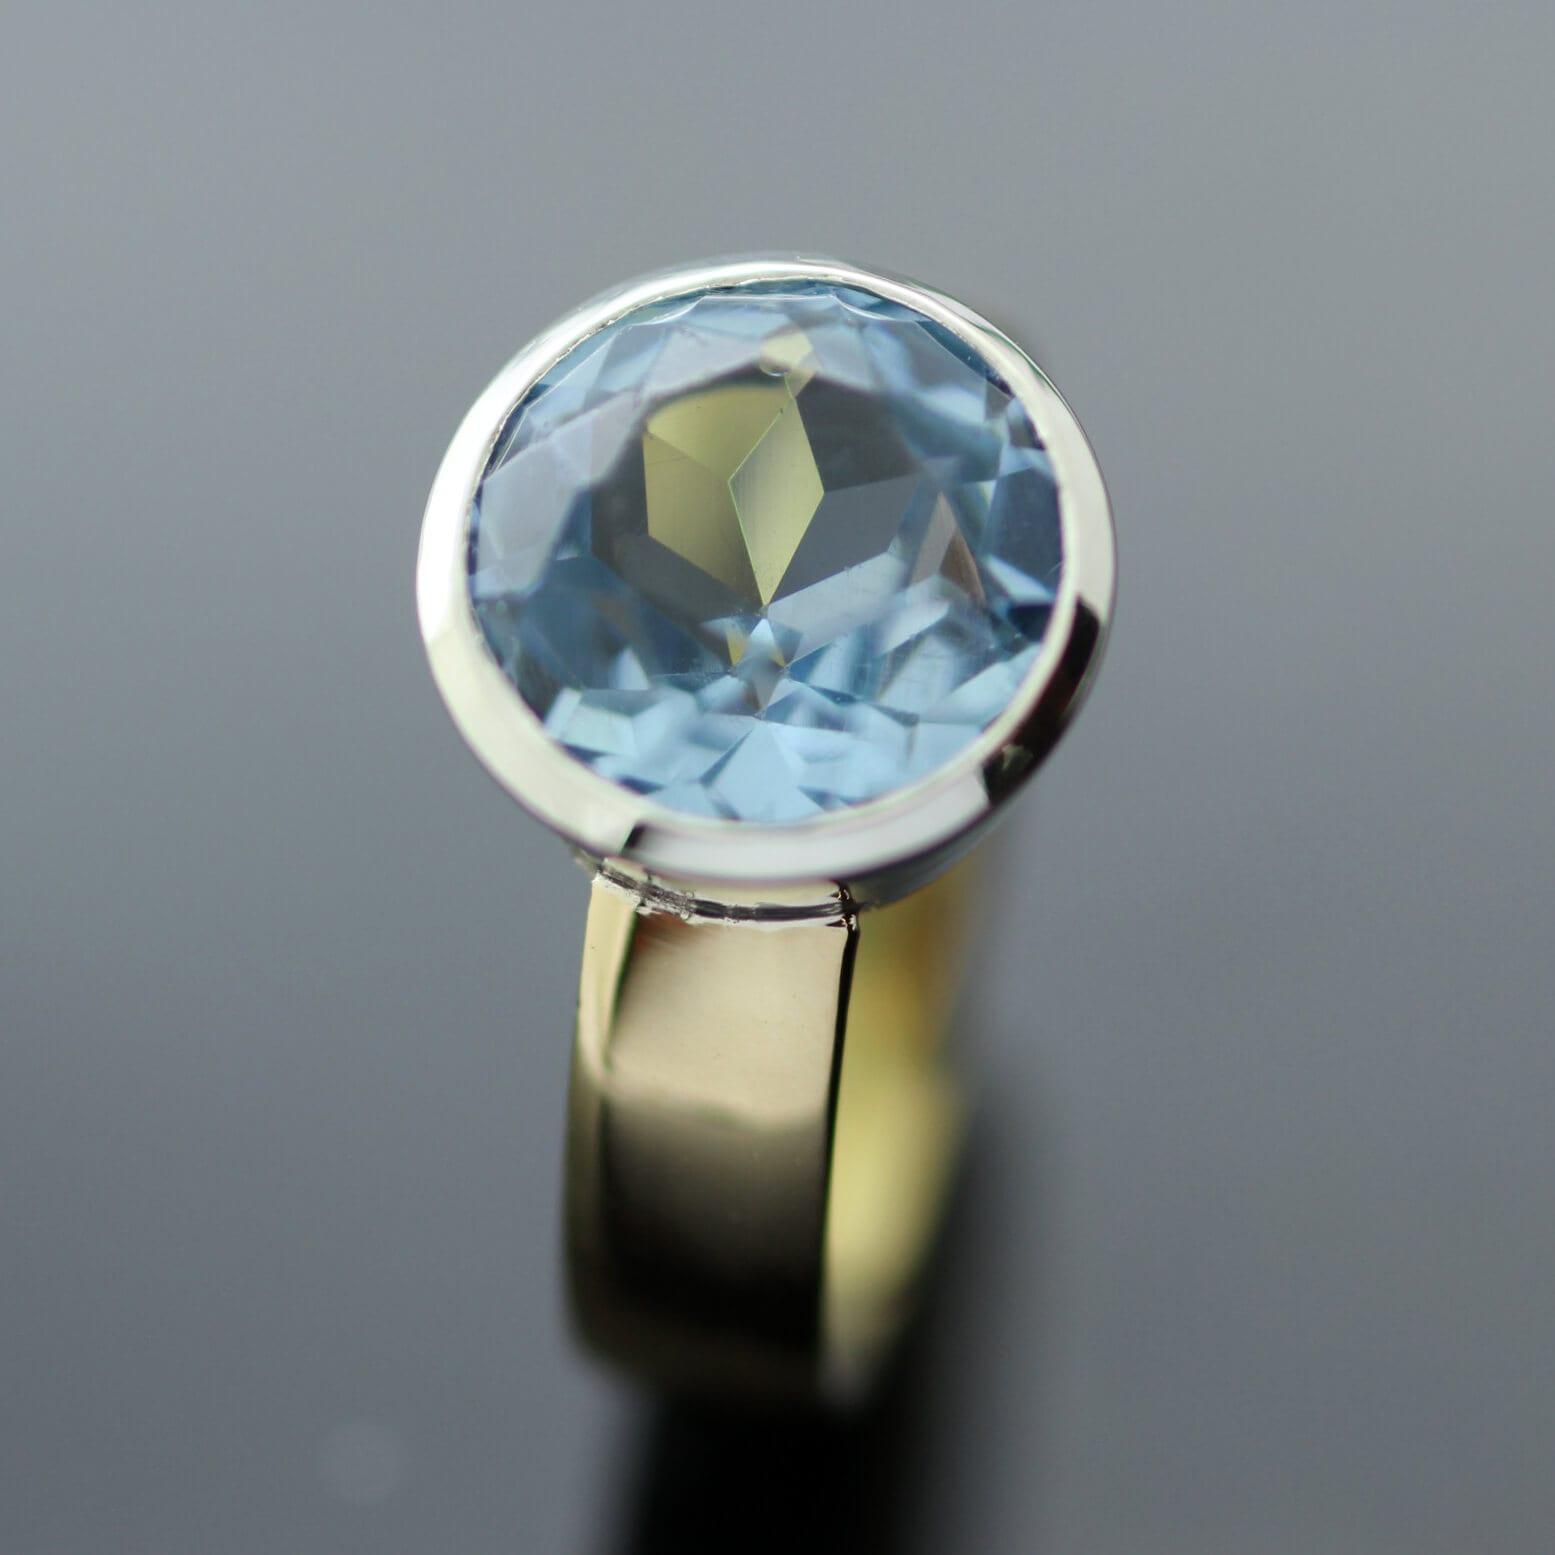 Bespoke handmade cocktail ring with Blue Topaz gemstone